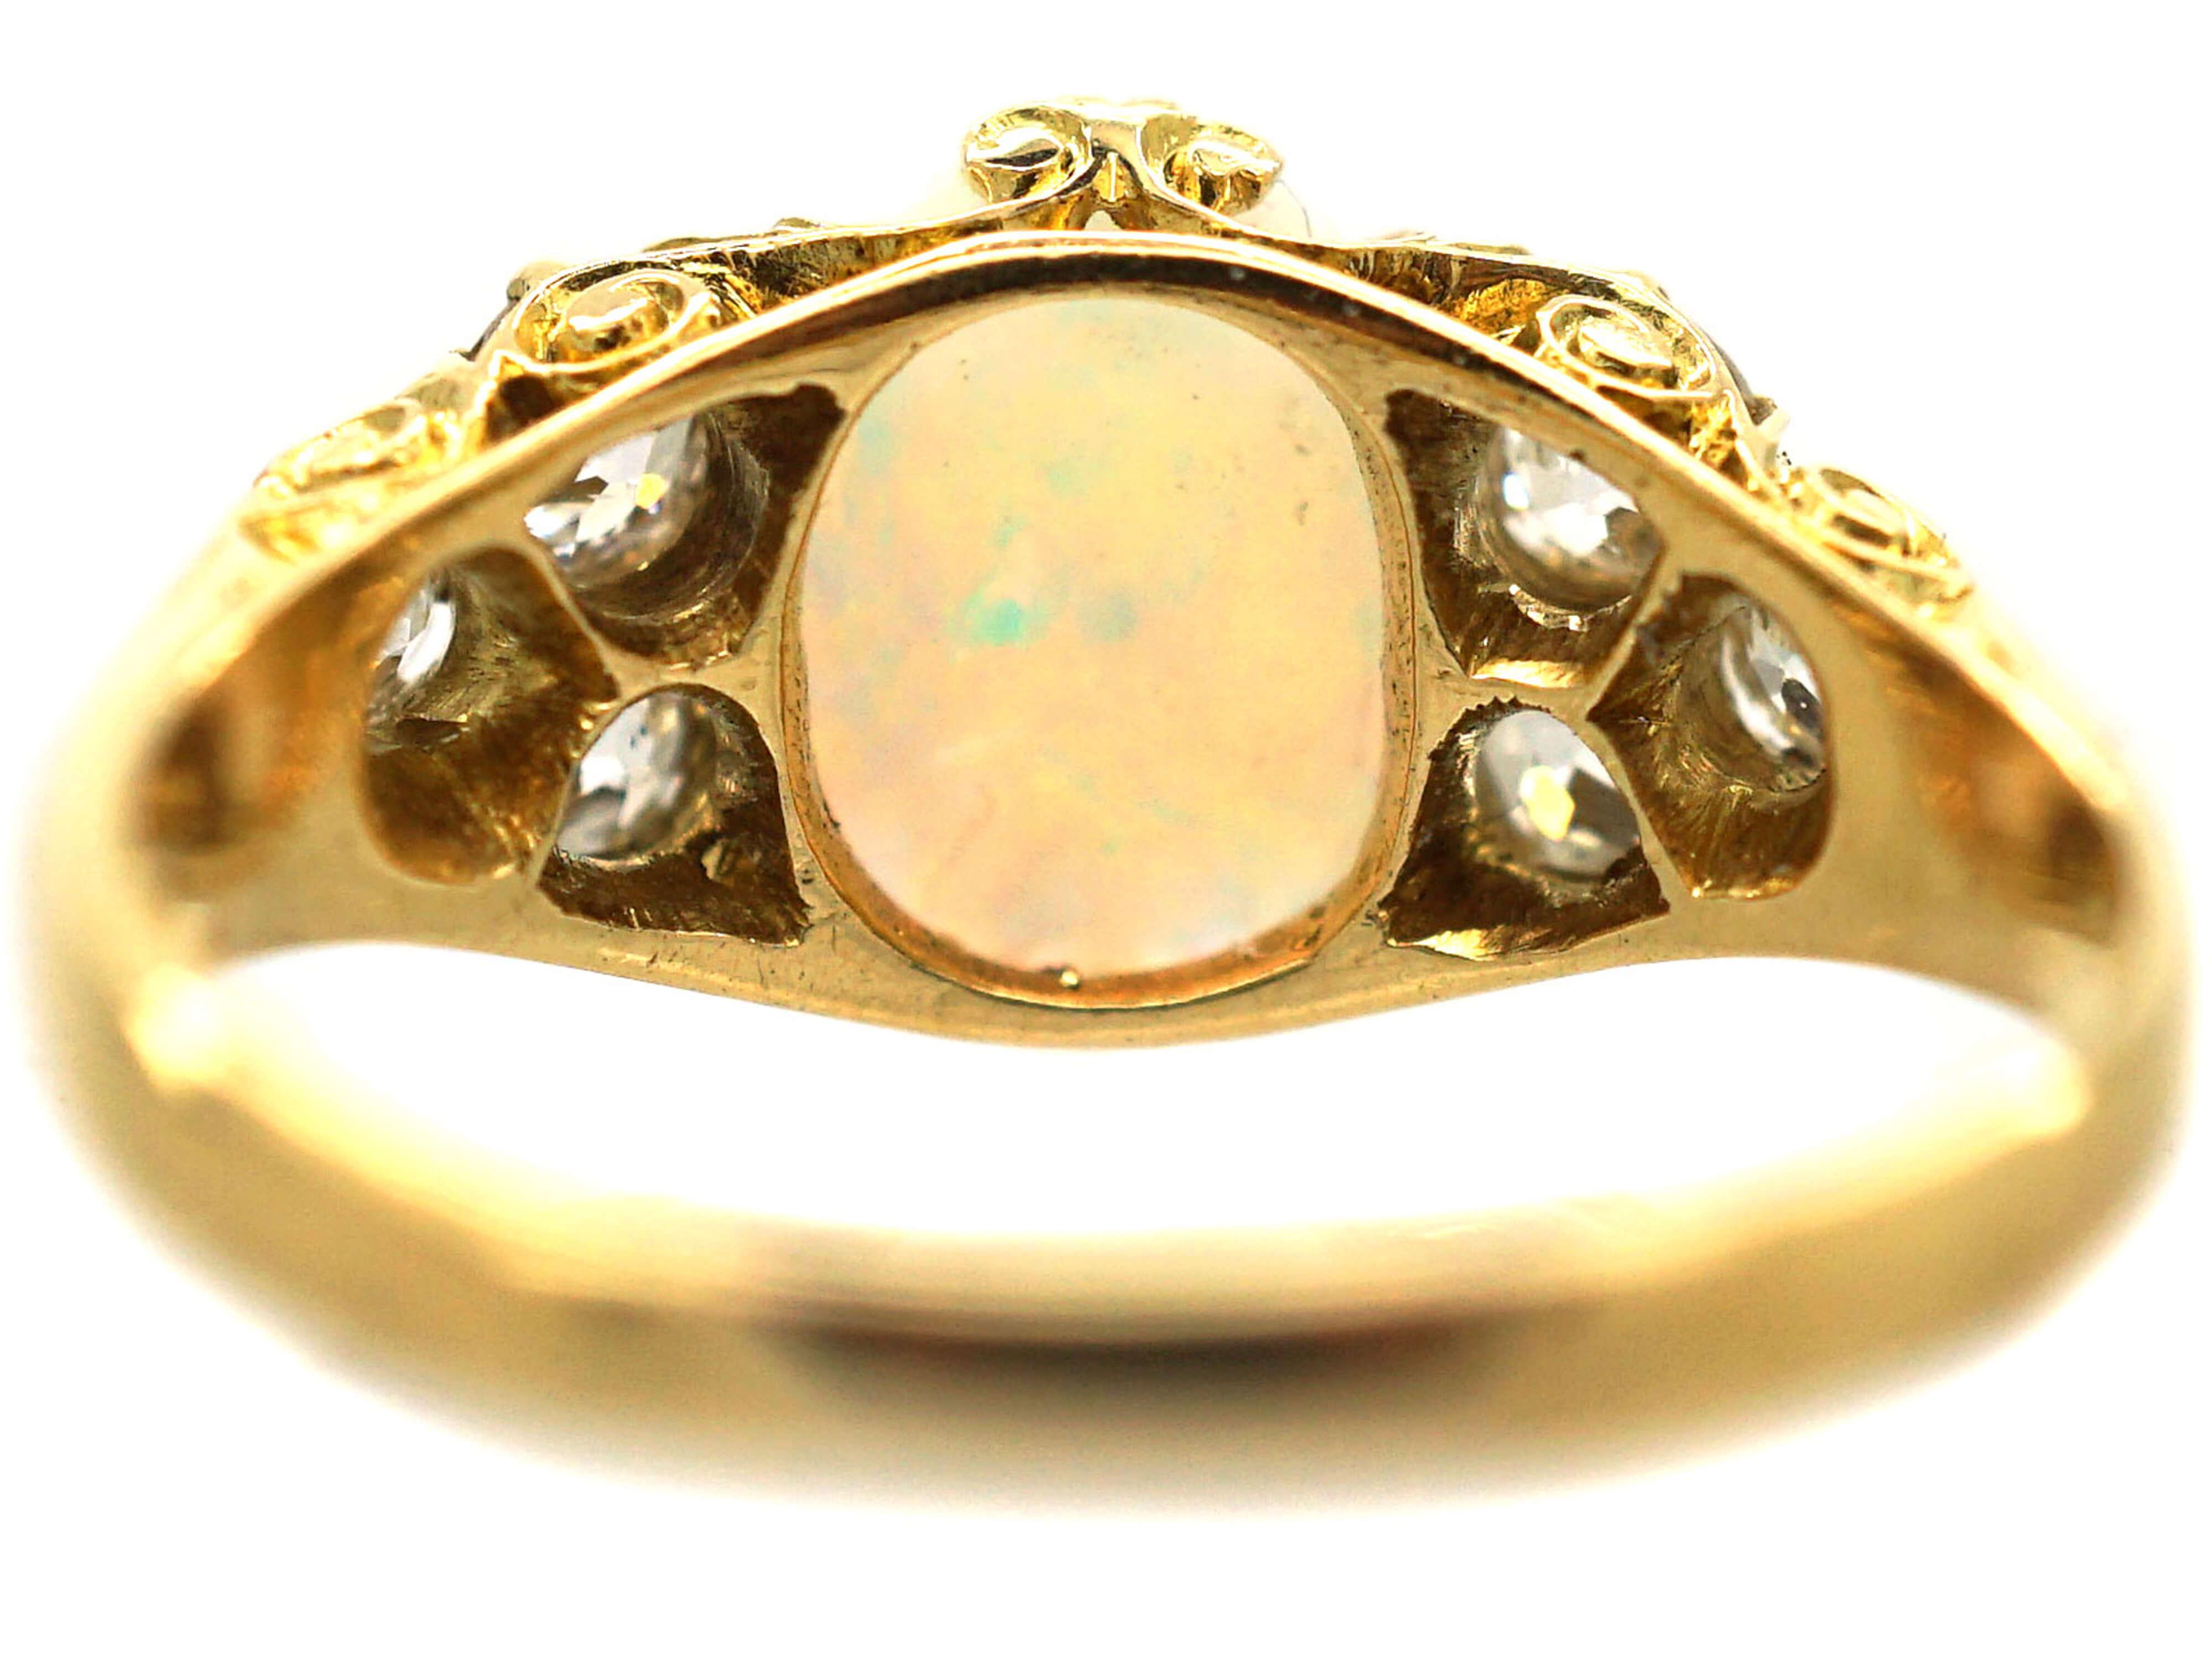 Edwardian 18ct Gold Opal & Diamond Ring